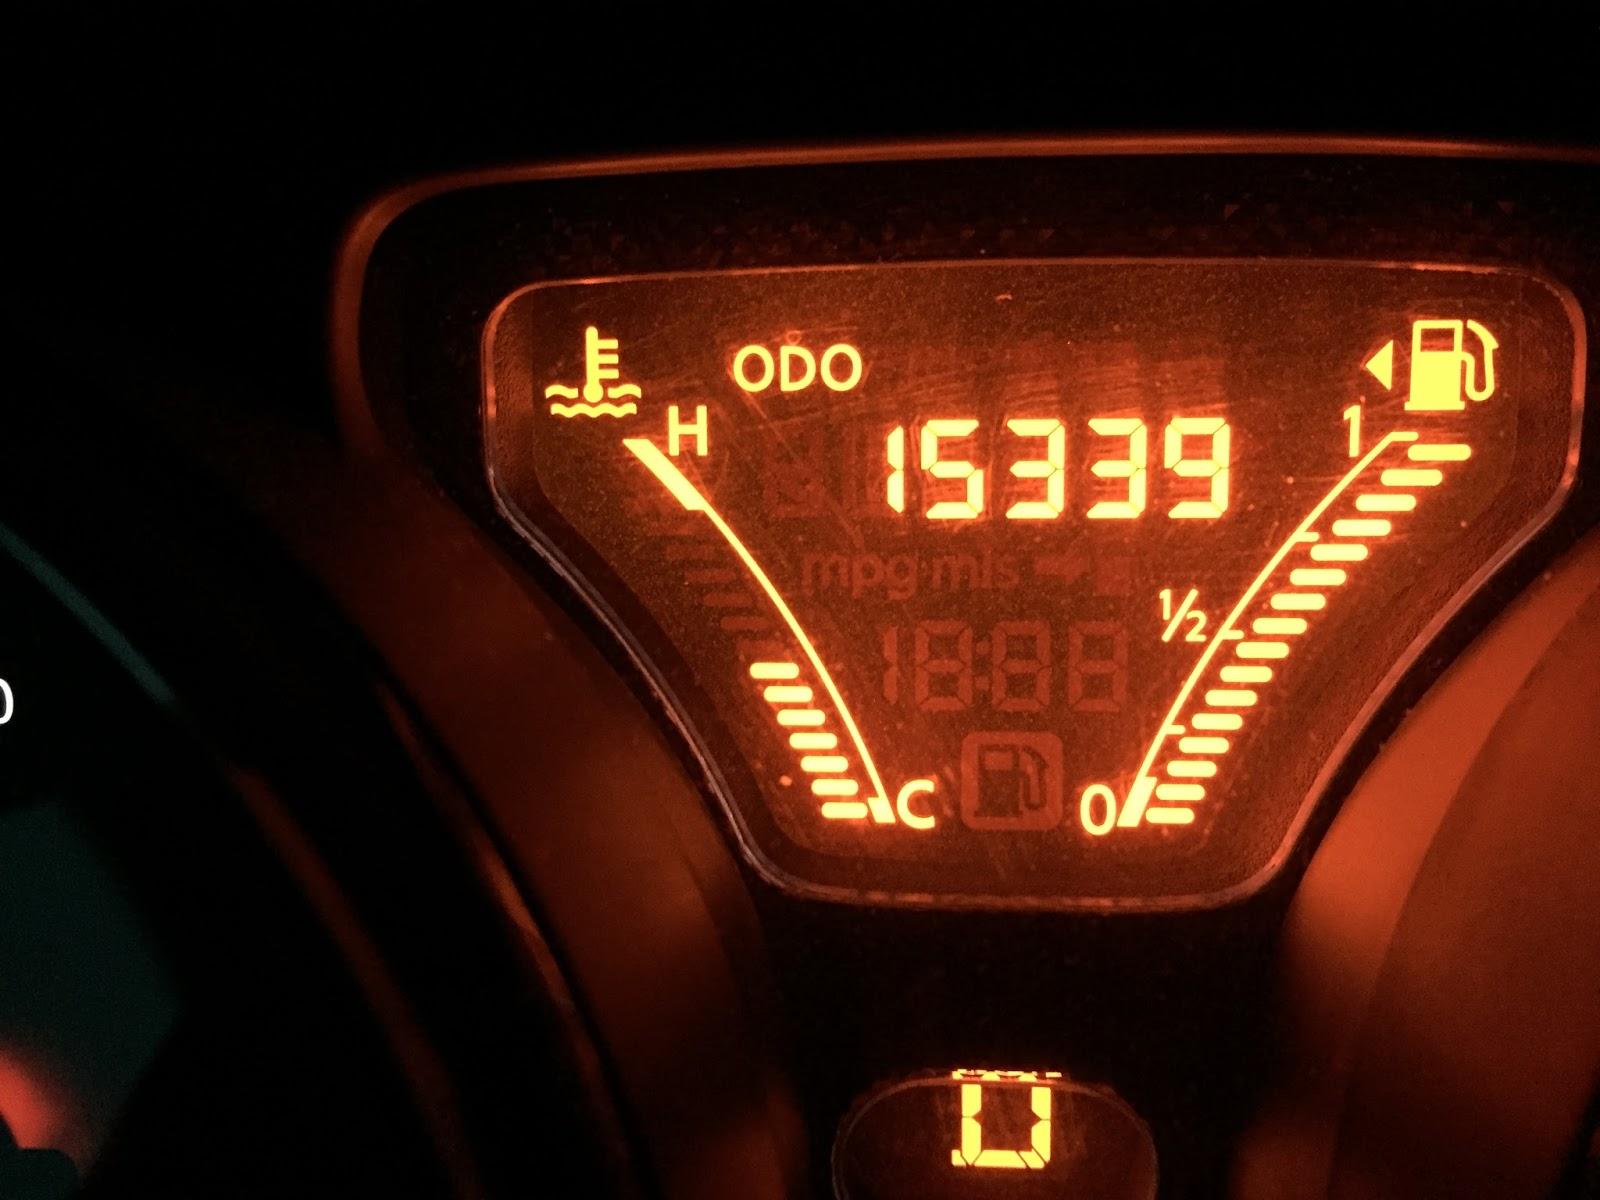 mileage report 31 7 average miles per gallon in 2014 nissan versa sv with odometer at 15339 miles. Black Bedroom Furniture Sets. Home Design Ideas